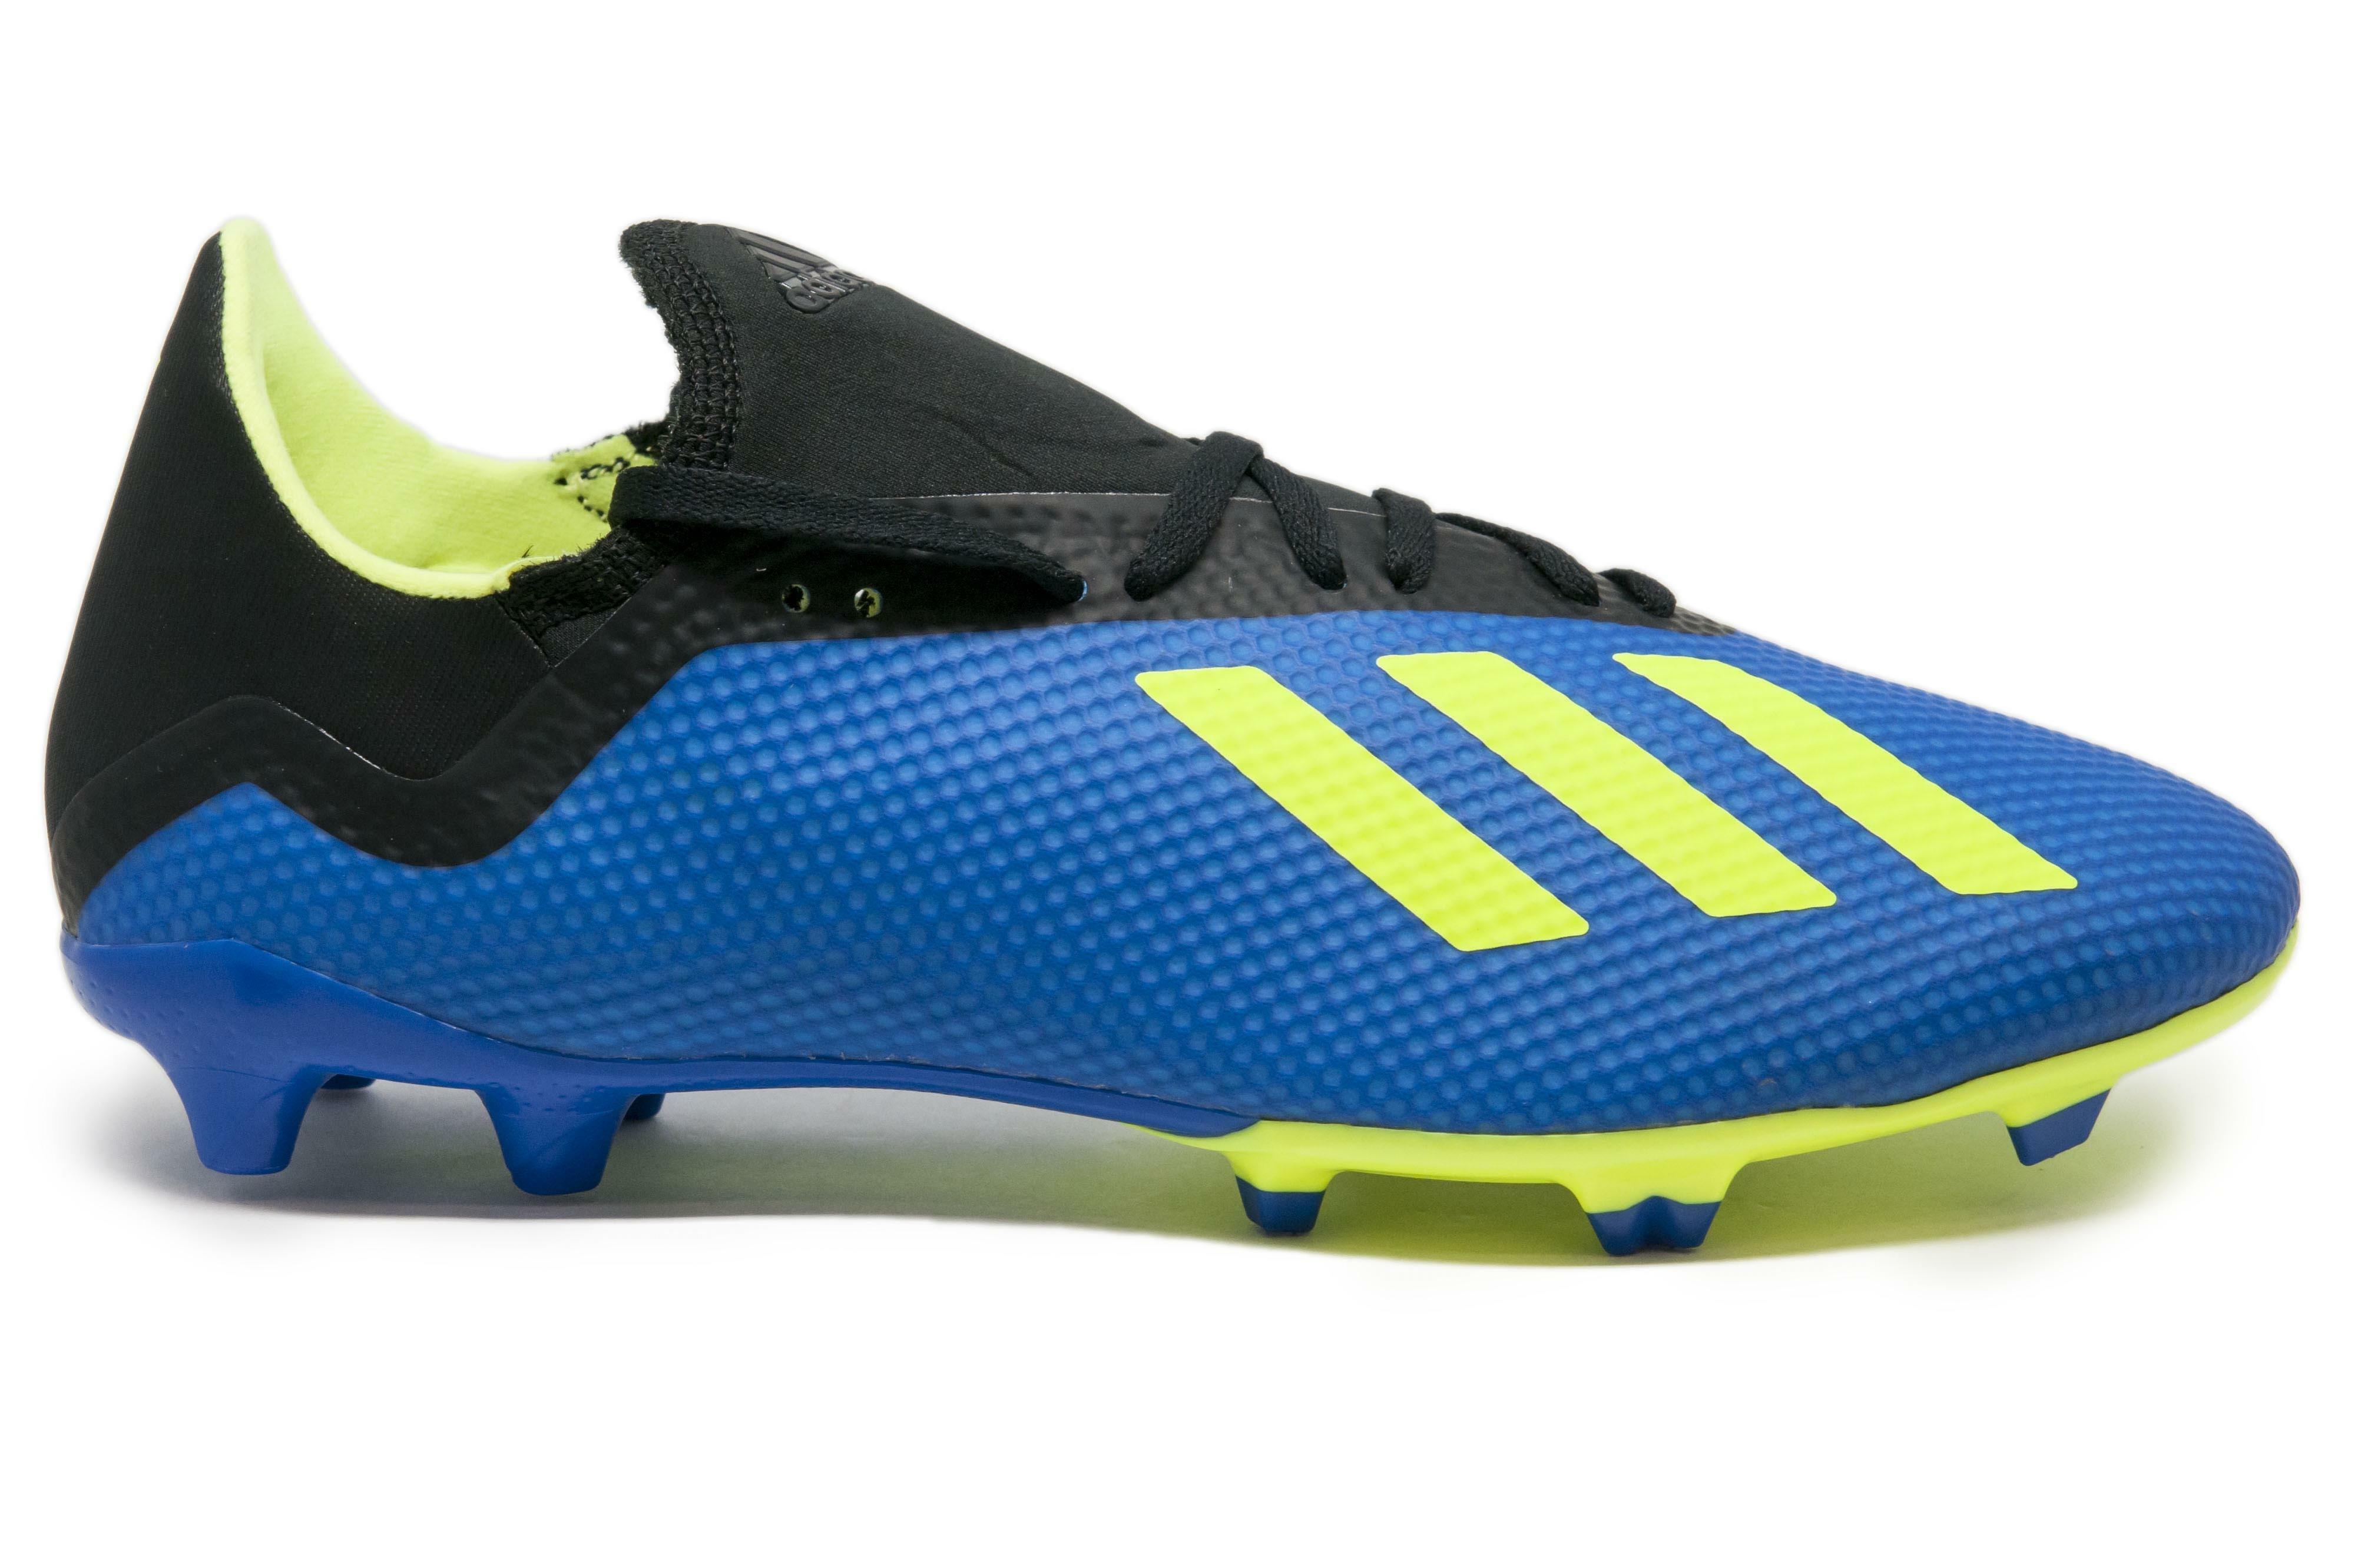 adidas adidas scarpa calcio x 18.3 fg azzurro/giallo fluo